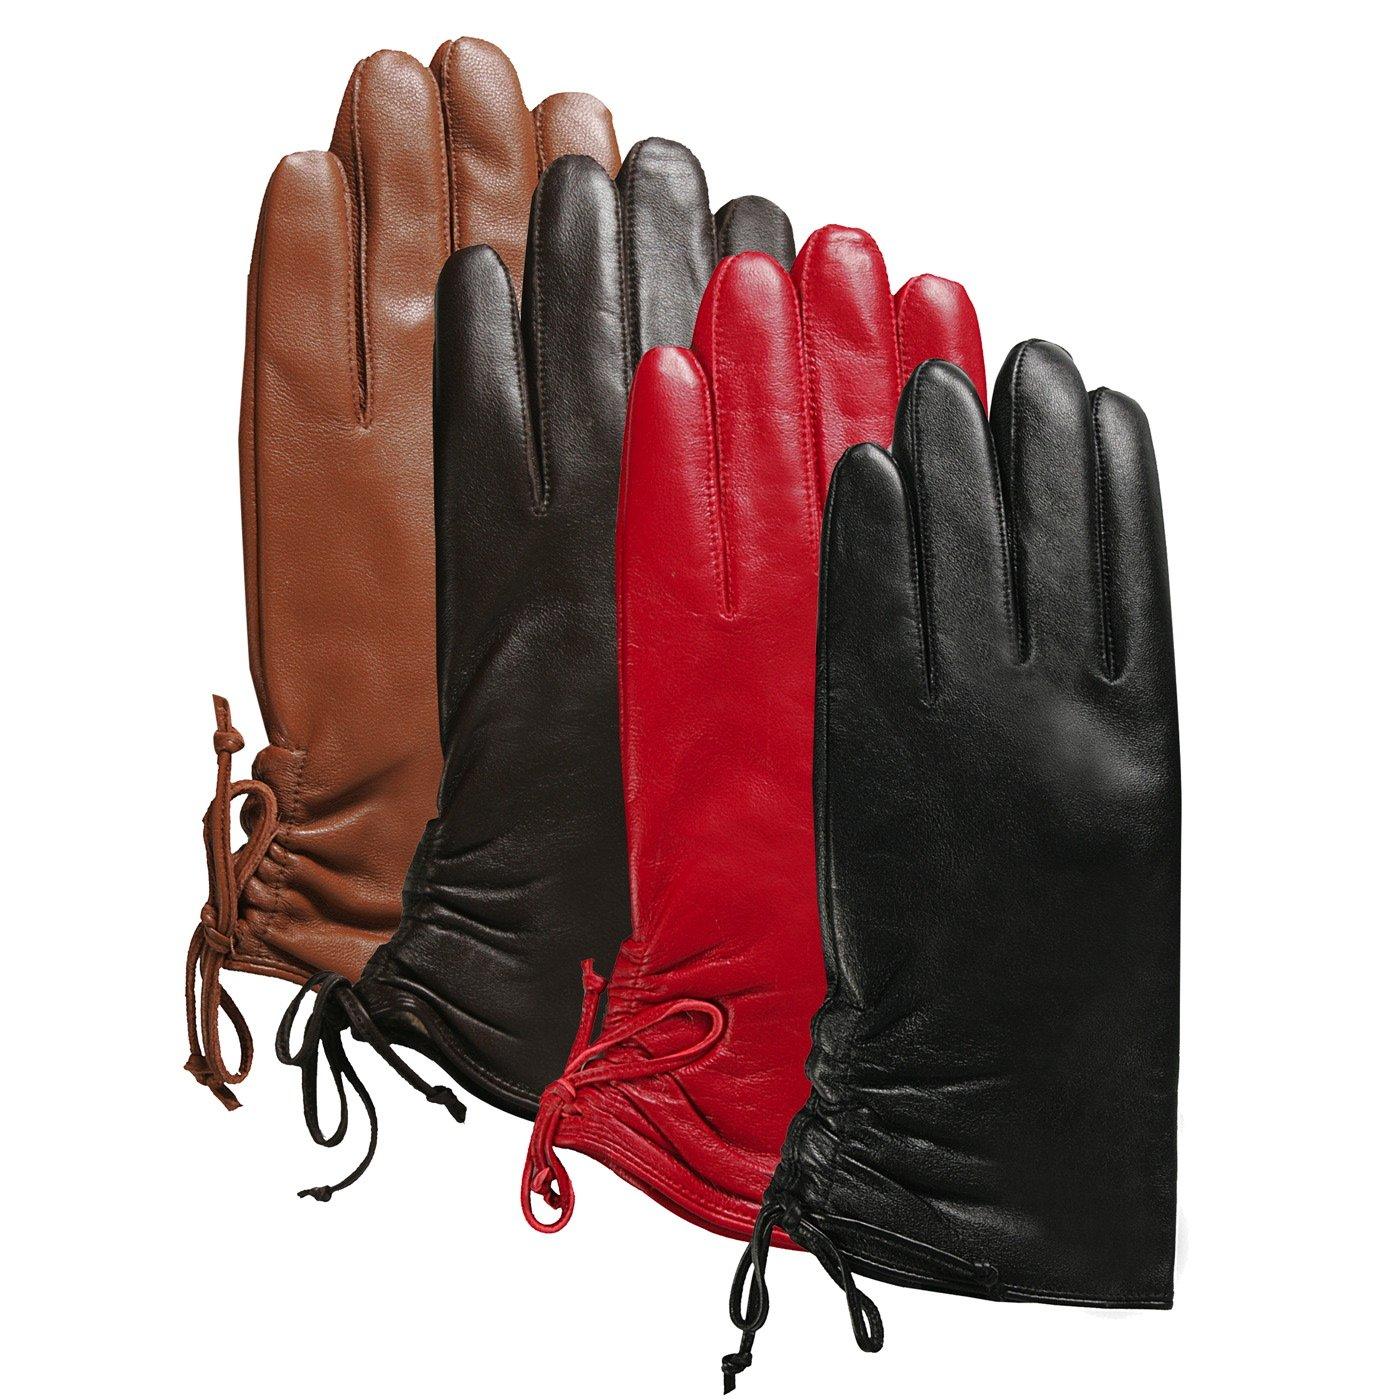 Luxury Lane Women's Lambskin Leather Ruched Tie Gloves - Tobacco M